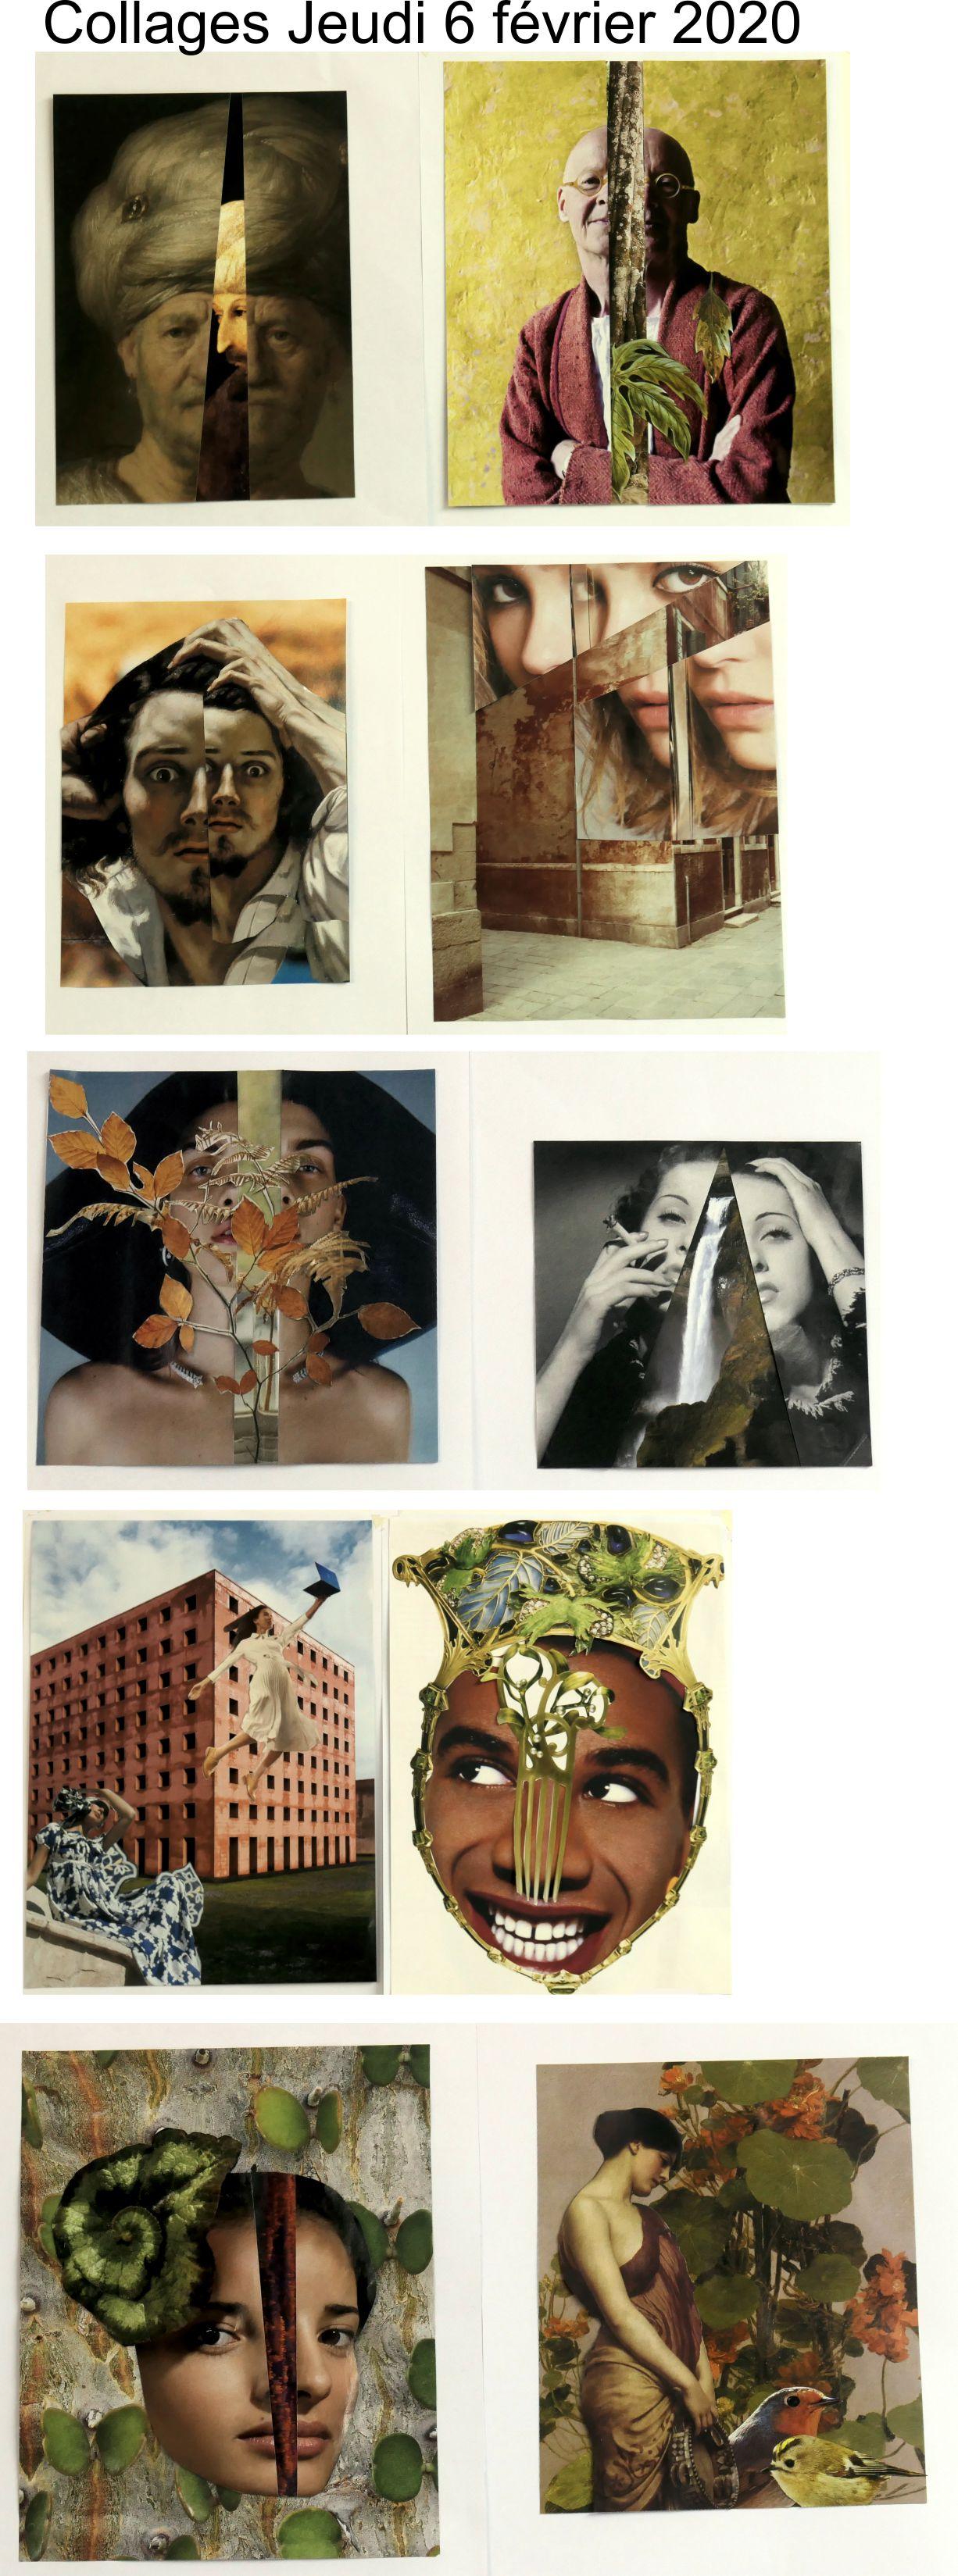 Collages jeudi 6 février 2020